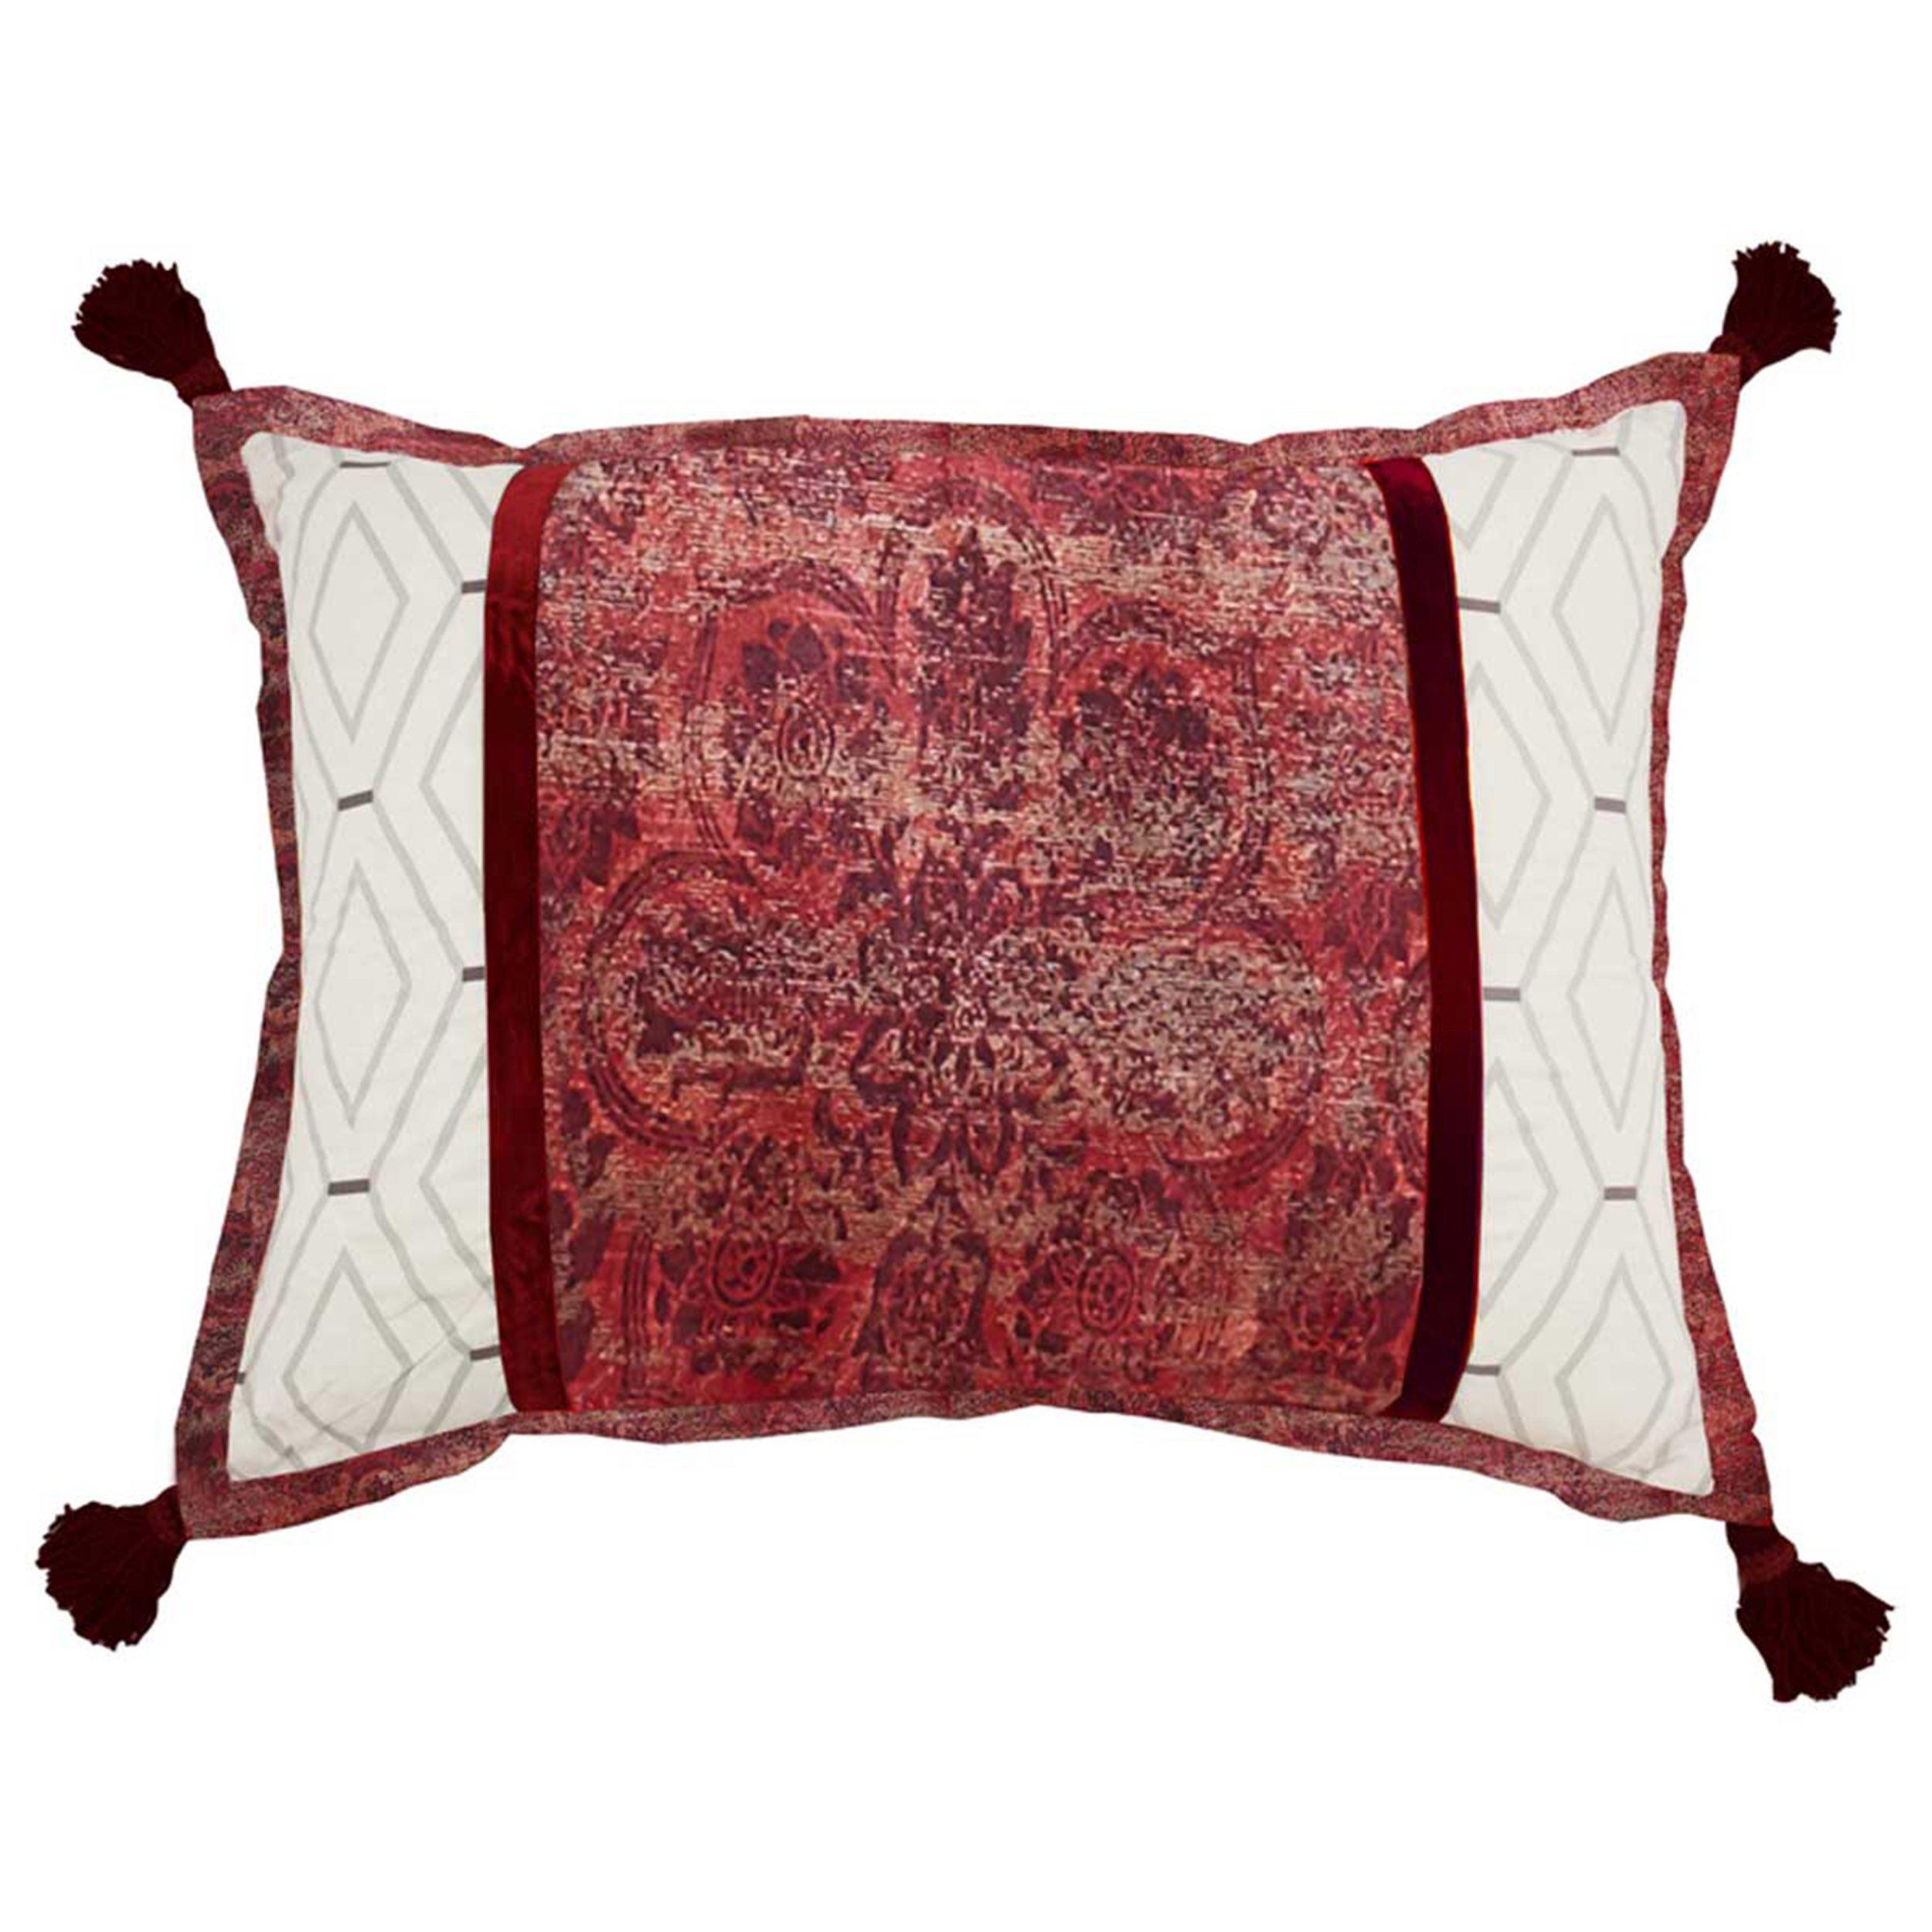 WAVERLY Fresco Flourish Decorative Pillow, 14x20, Jewel